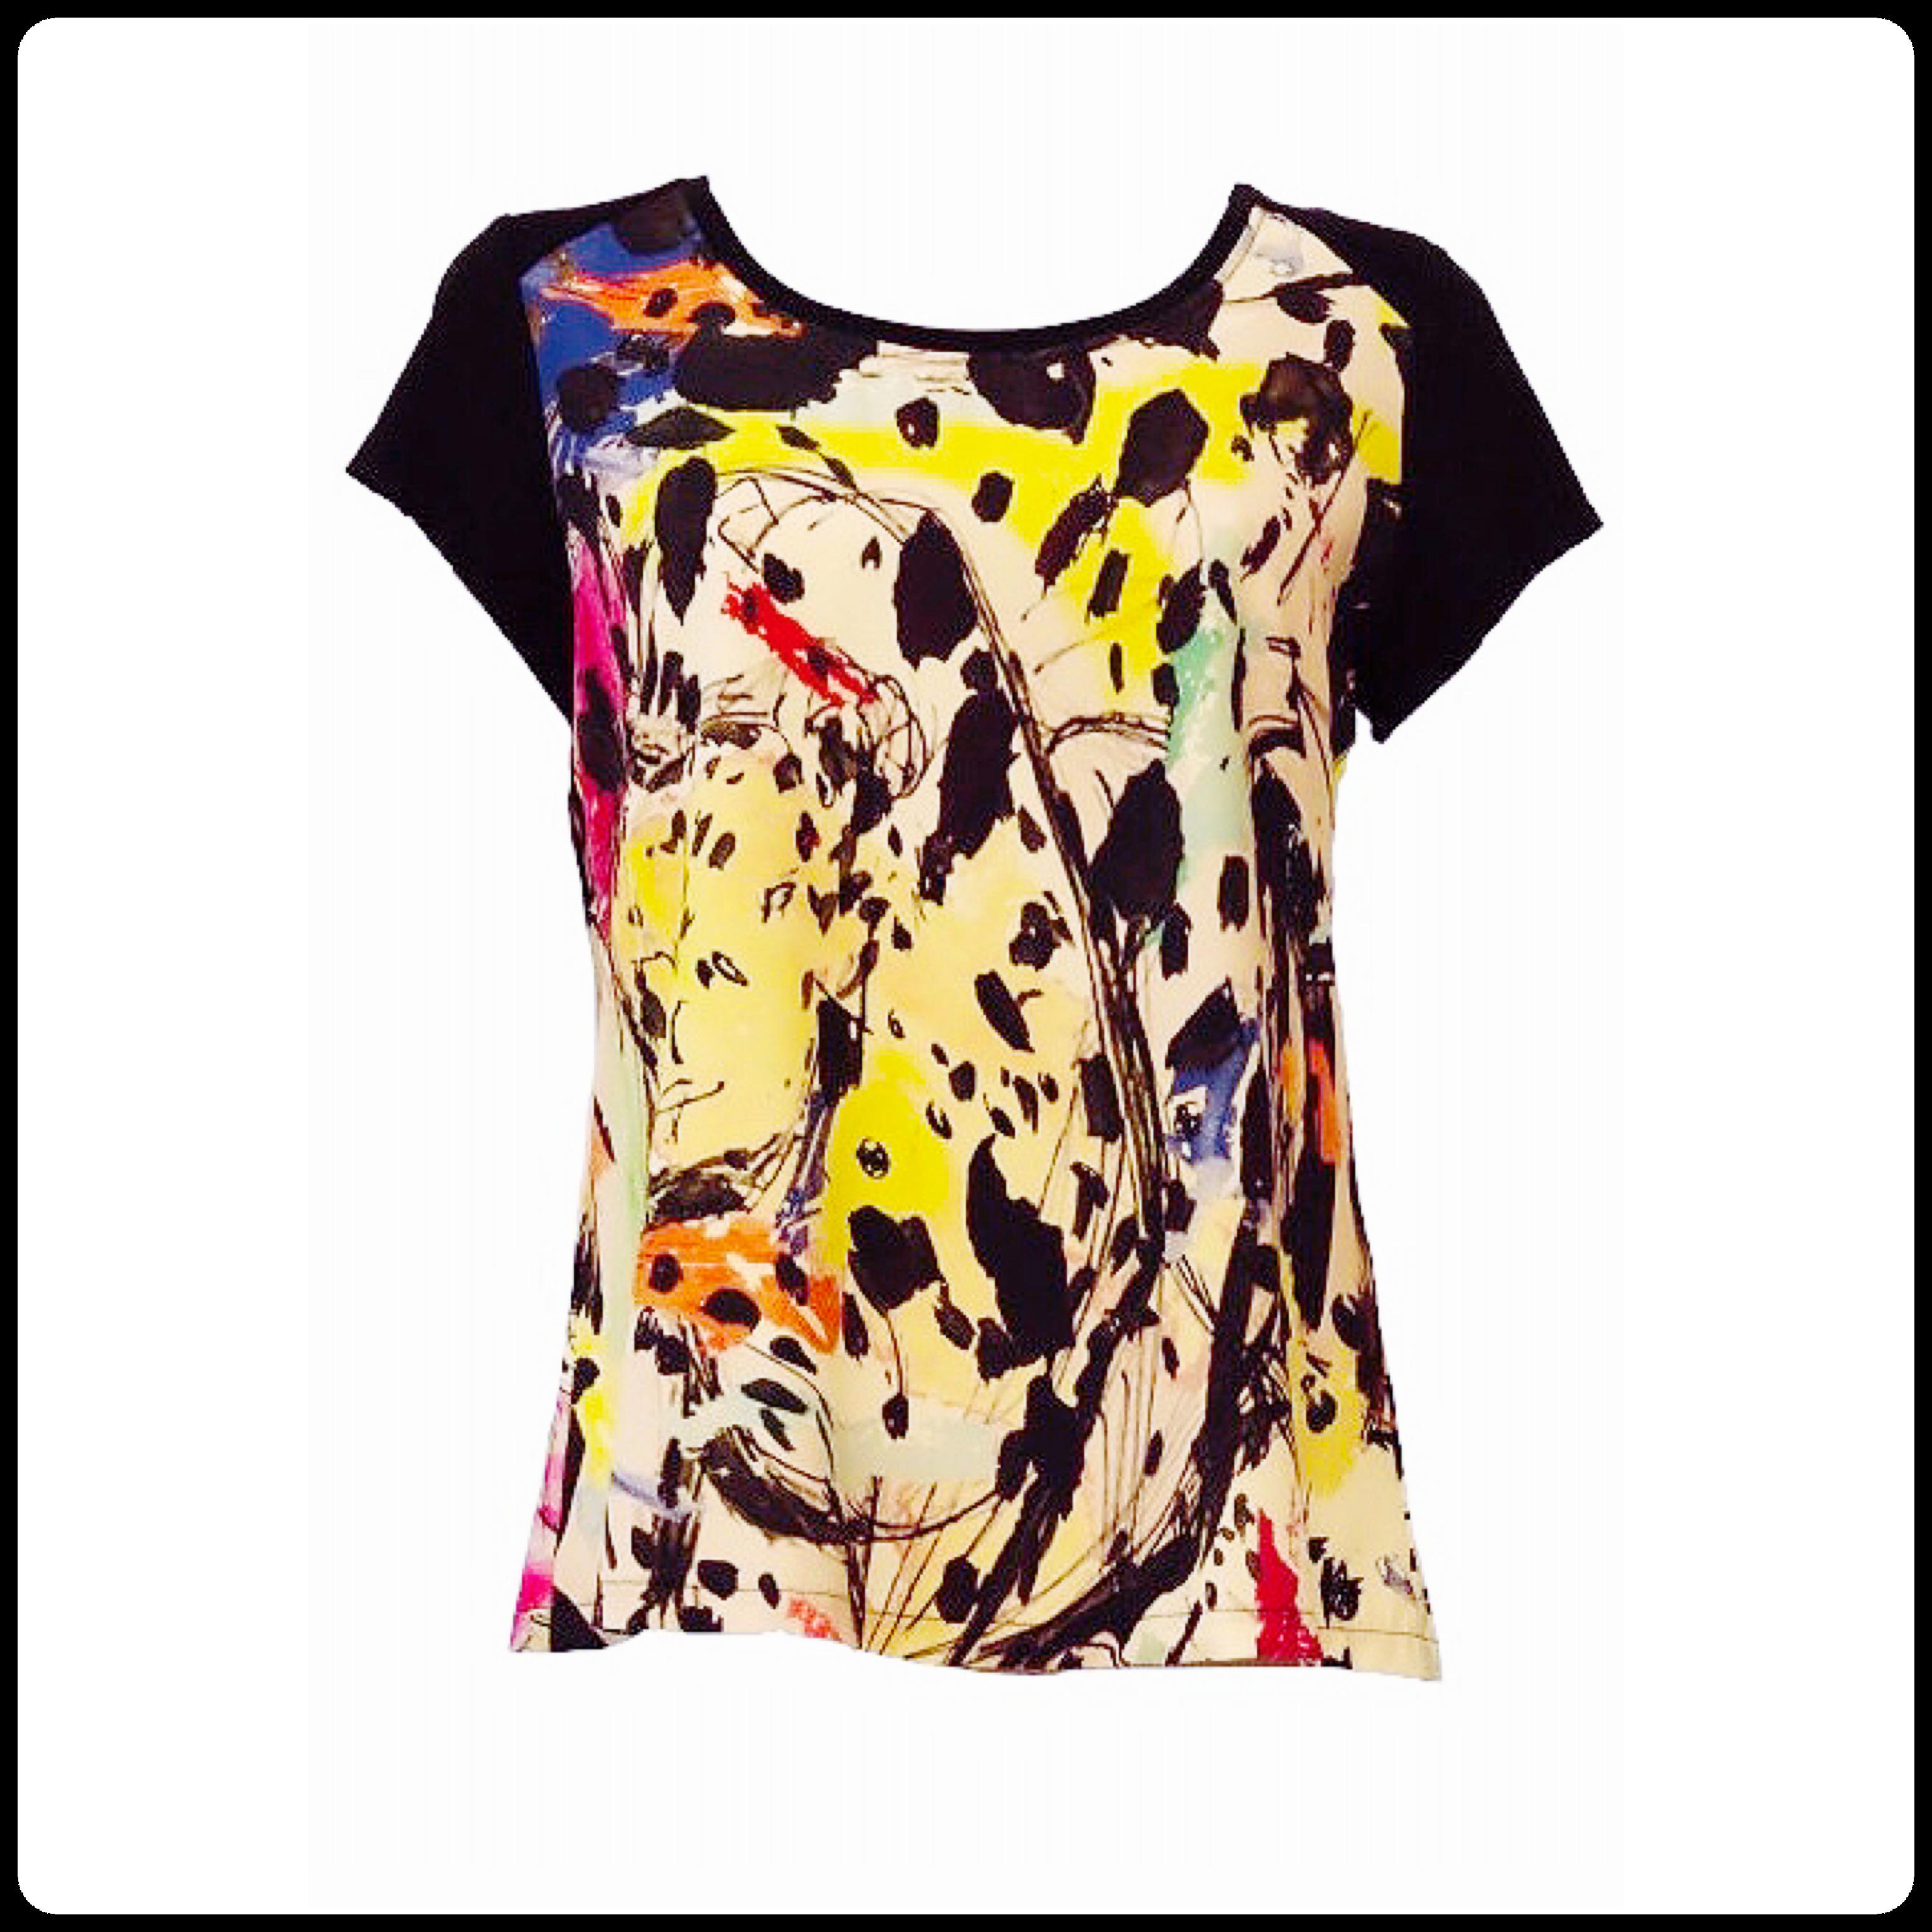 Maloka: Pink Leopard Faux Split Abstract Art T-Shirt (1 Left!) MK_OSIANA_N